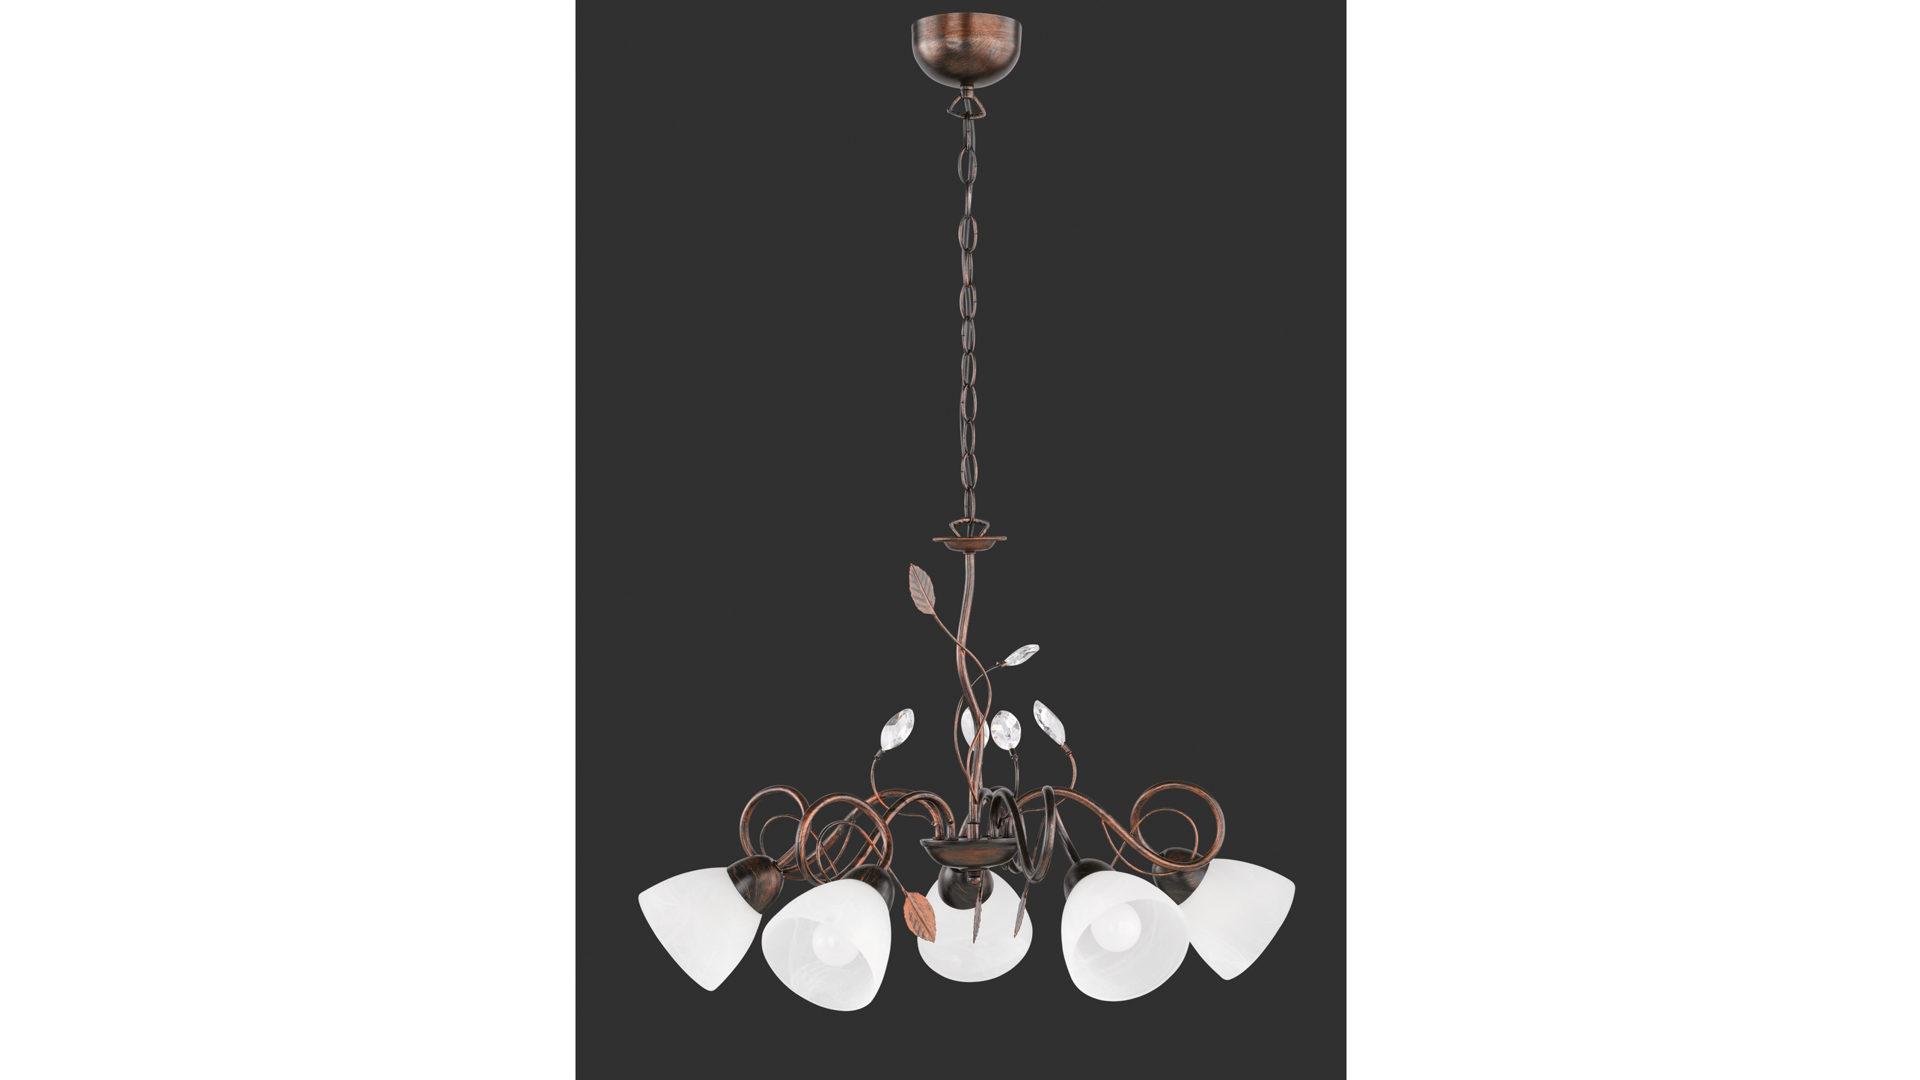 Lampenschirme Klein Kronleuchter ~ Kronleuchter antik rostfarbenes metall u2013 fünf lampenschirme bad